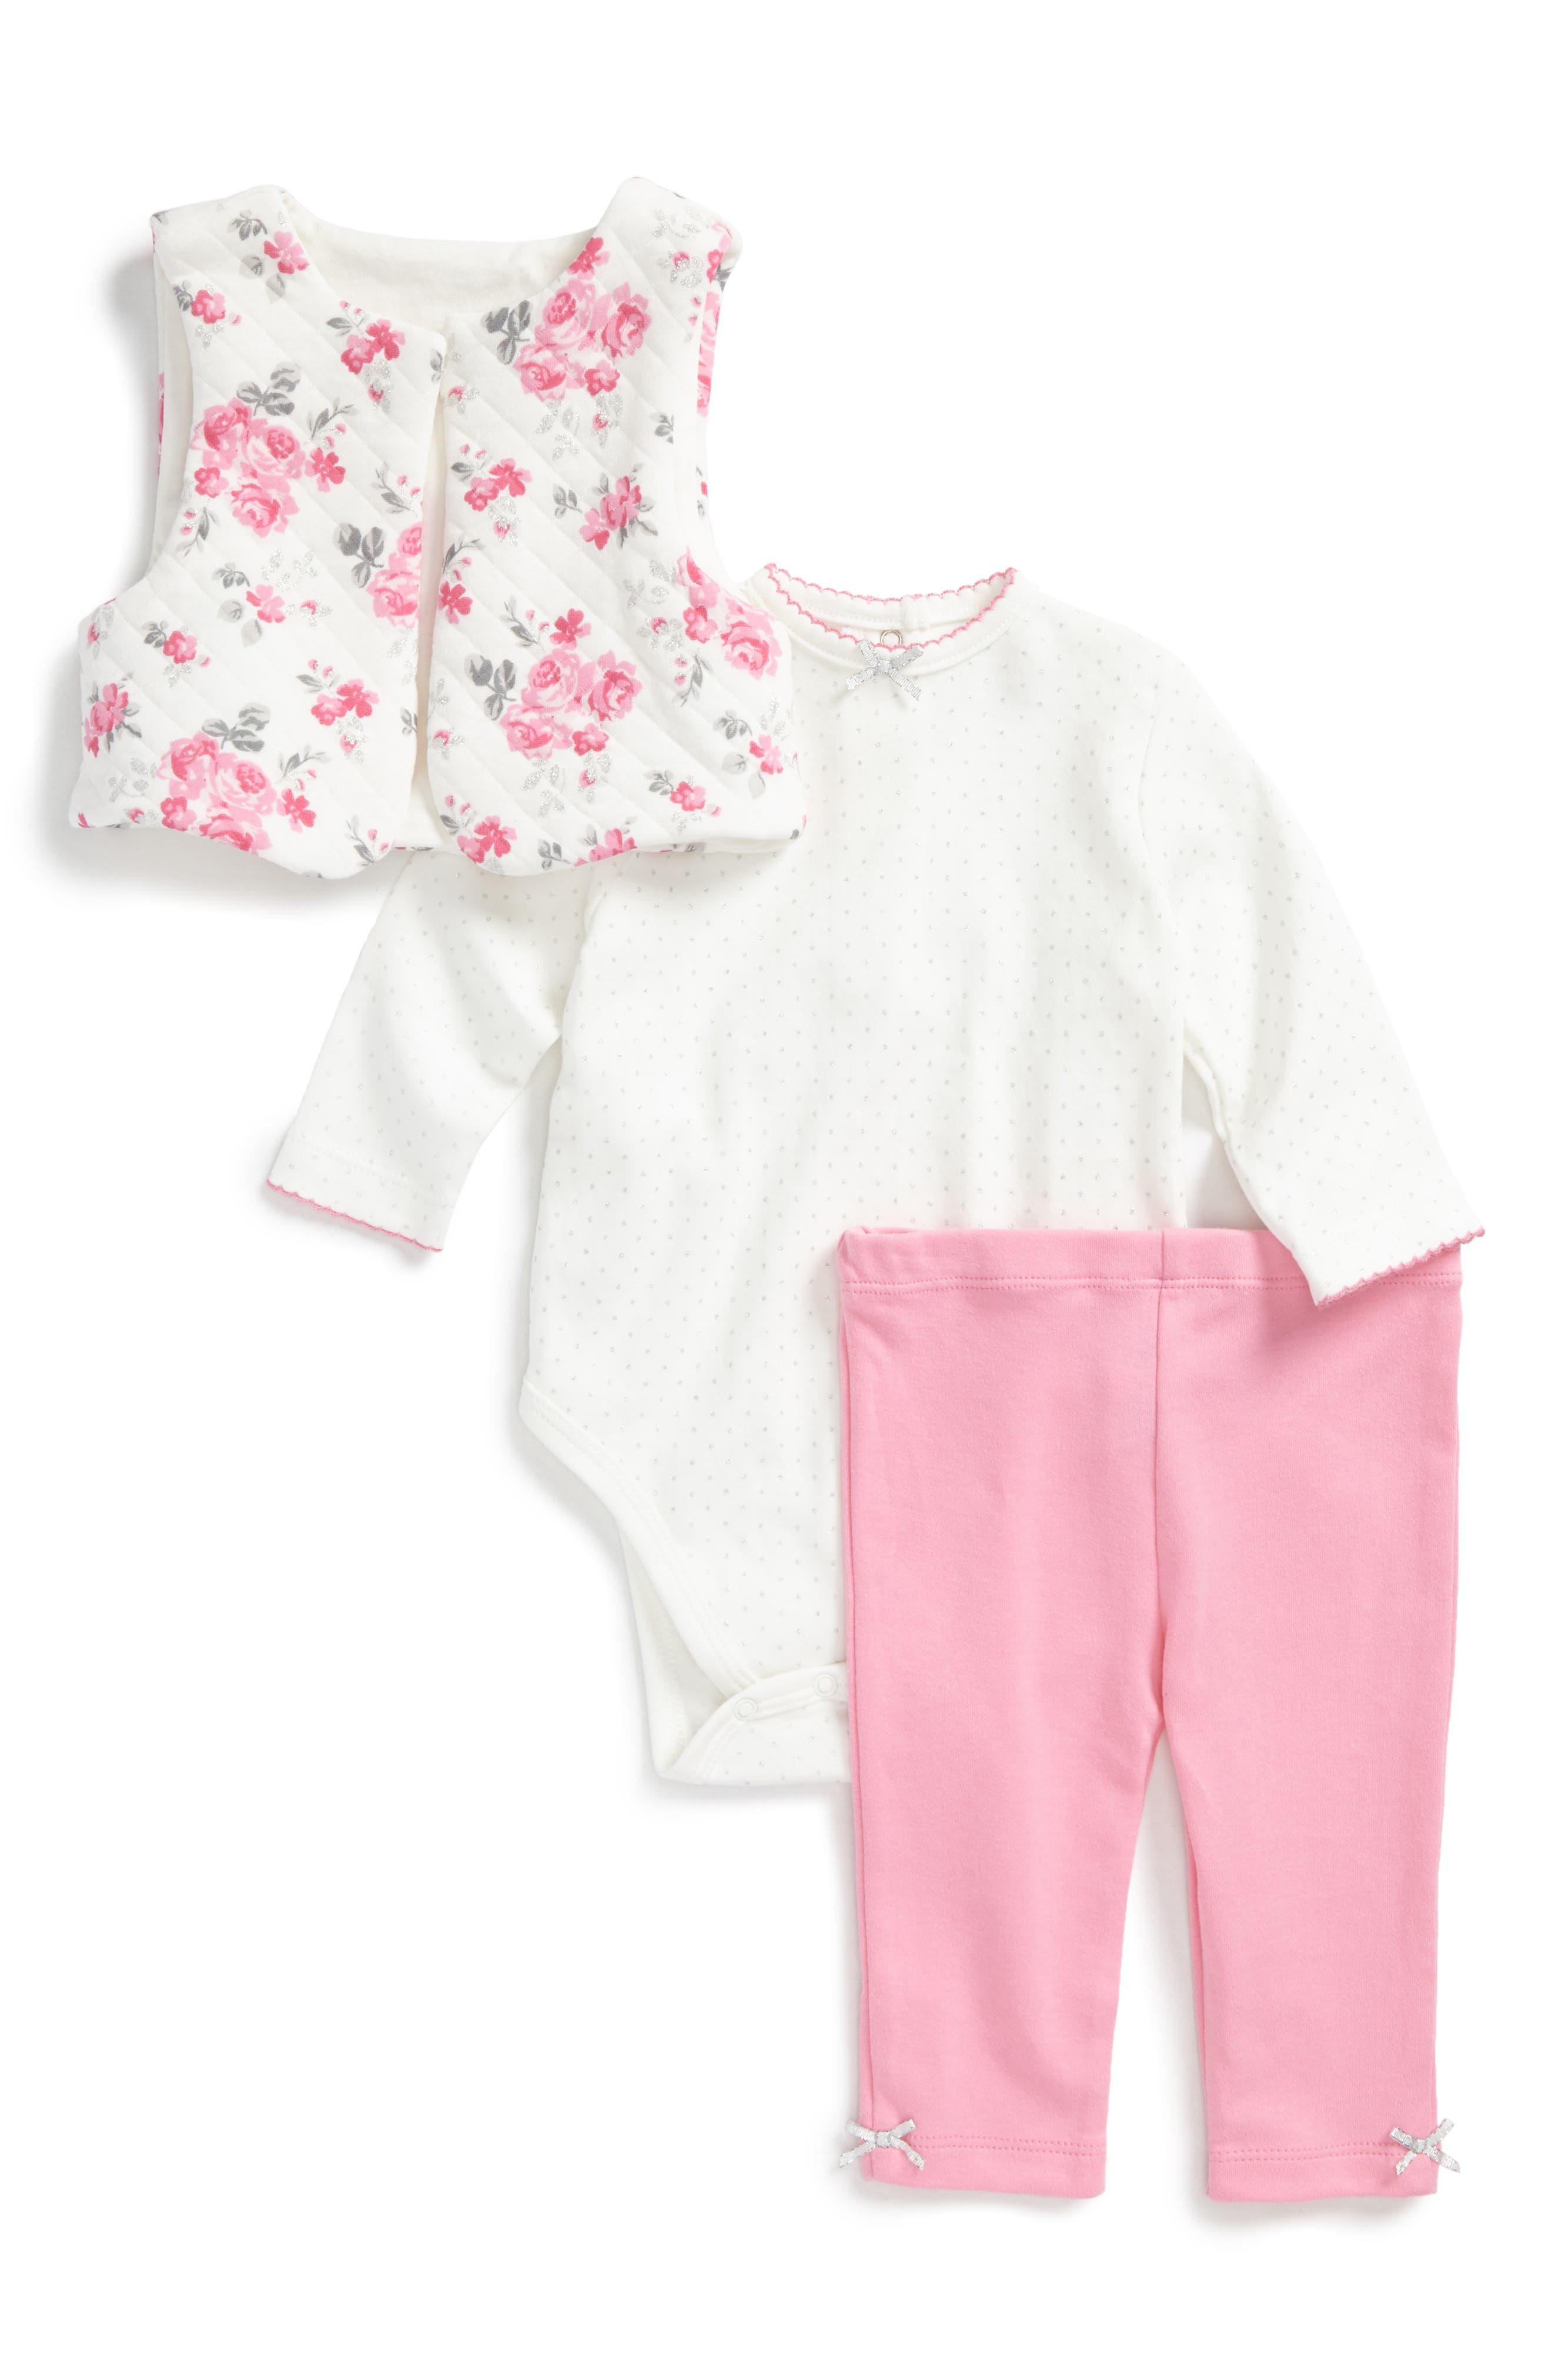 Main Image - Little Me Rose Bodysuit, Leggings & Quilted Vest Set (Baby Girls)